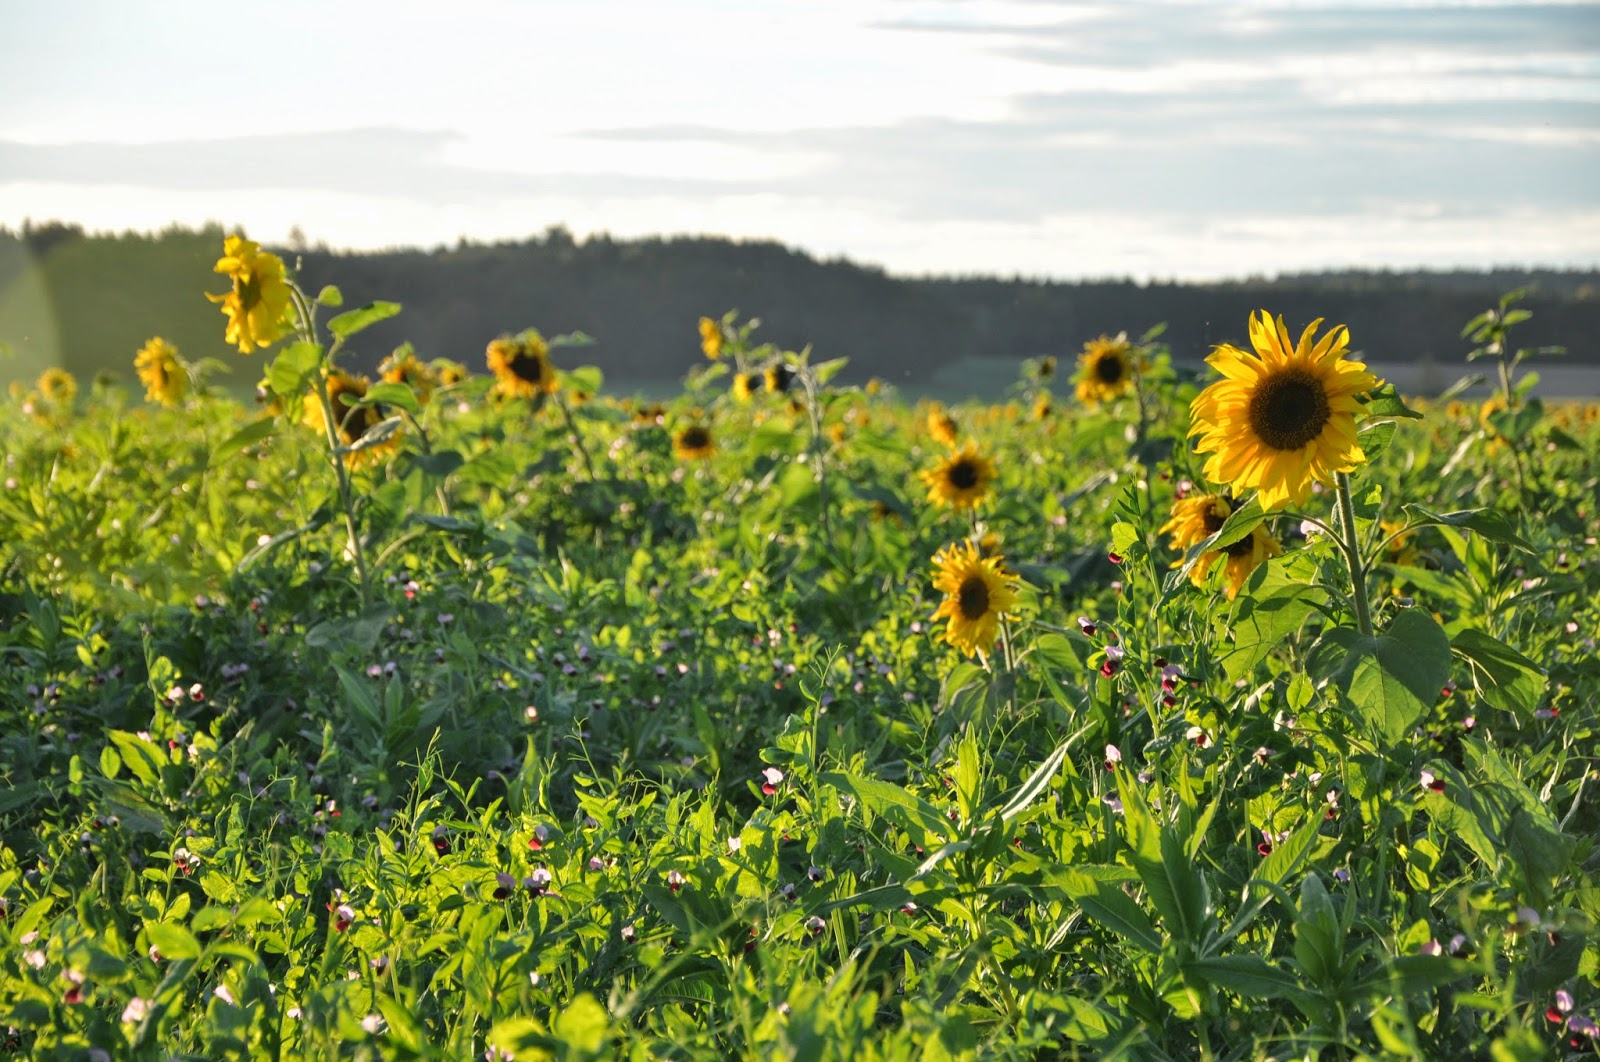 Herbst-Impressionen | Spätsommersonne über dem Sonnenblumenfeld